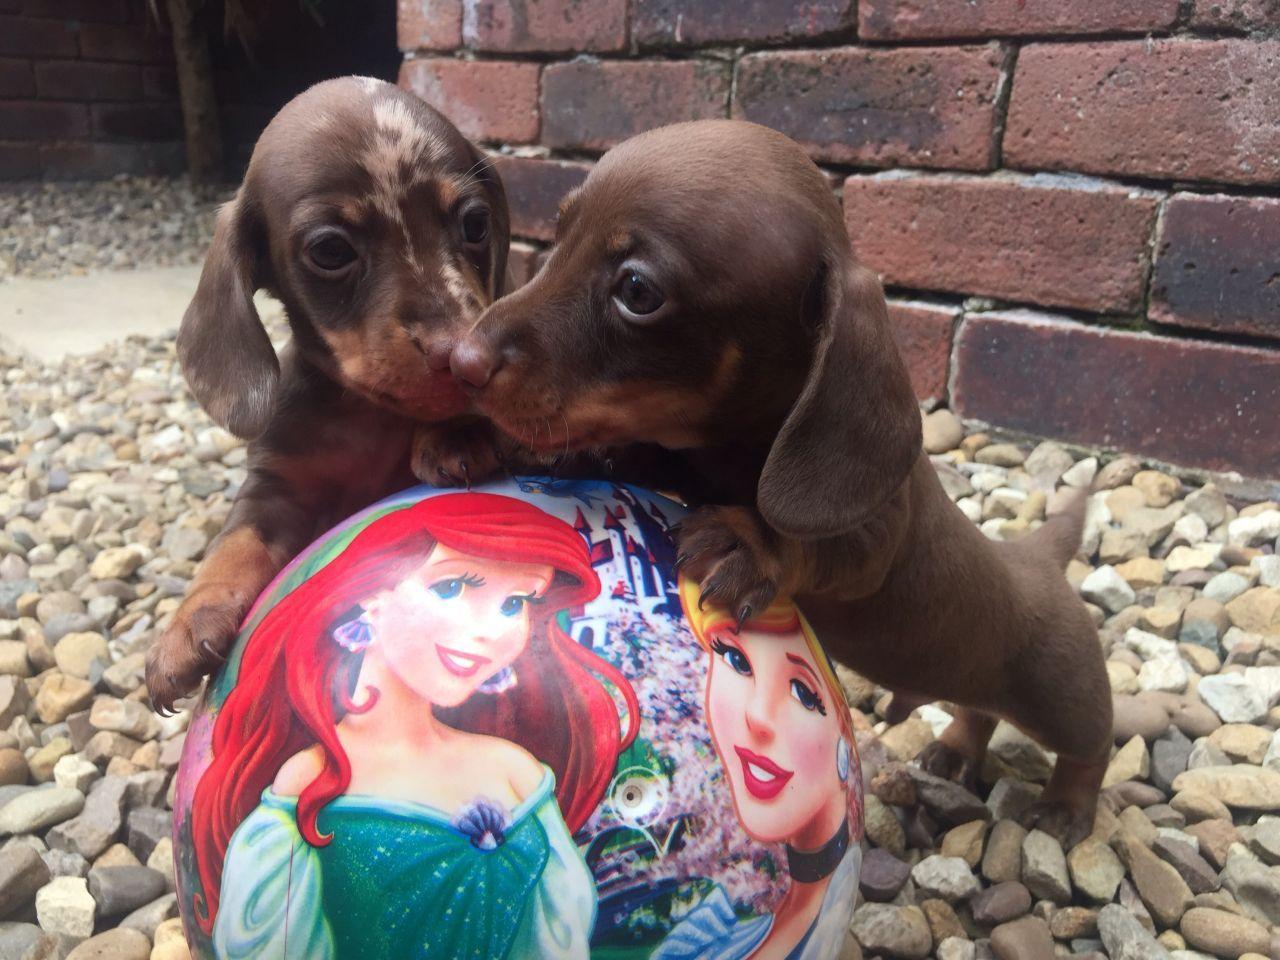 Kc Miniature Dachshunds Puppies Arrived Miniature Dachshunds